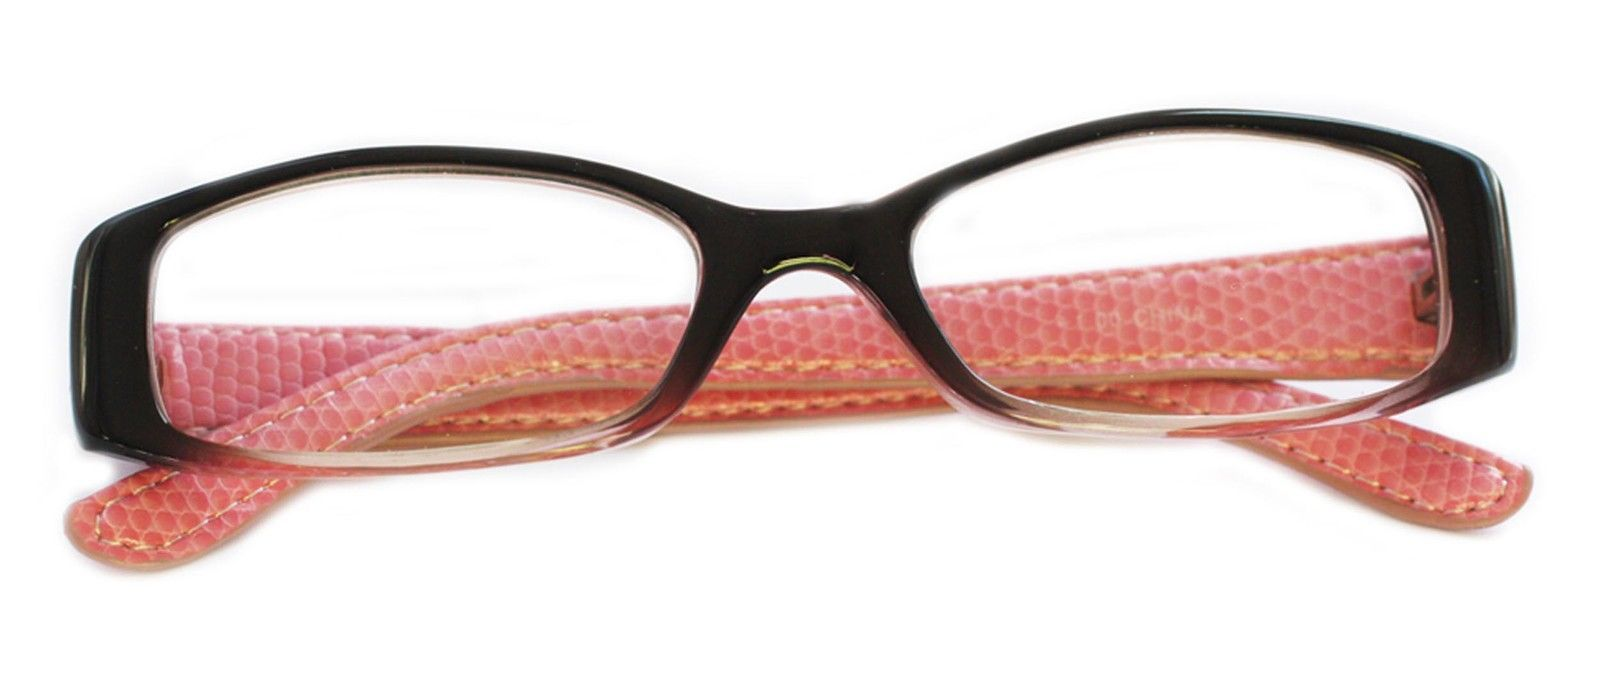 Leather Frame Reading Glasses : Reading Glasses ~ Posh ~ Rectangle Black Pink Frame ...